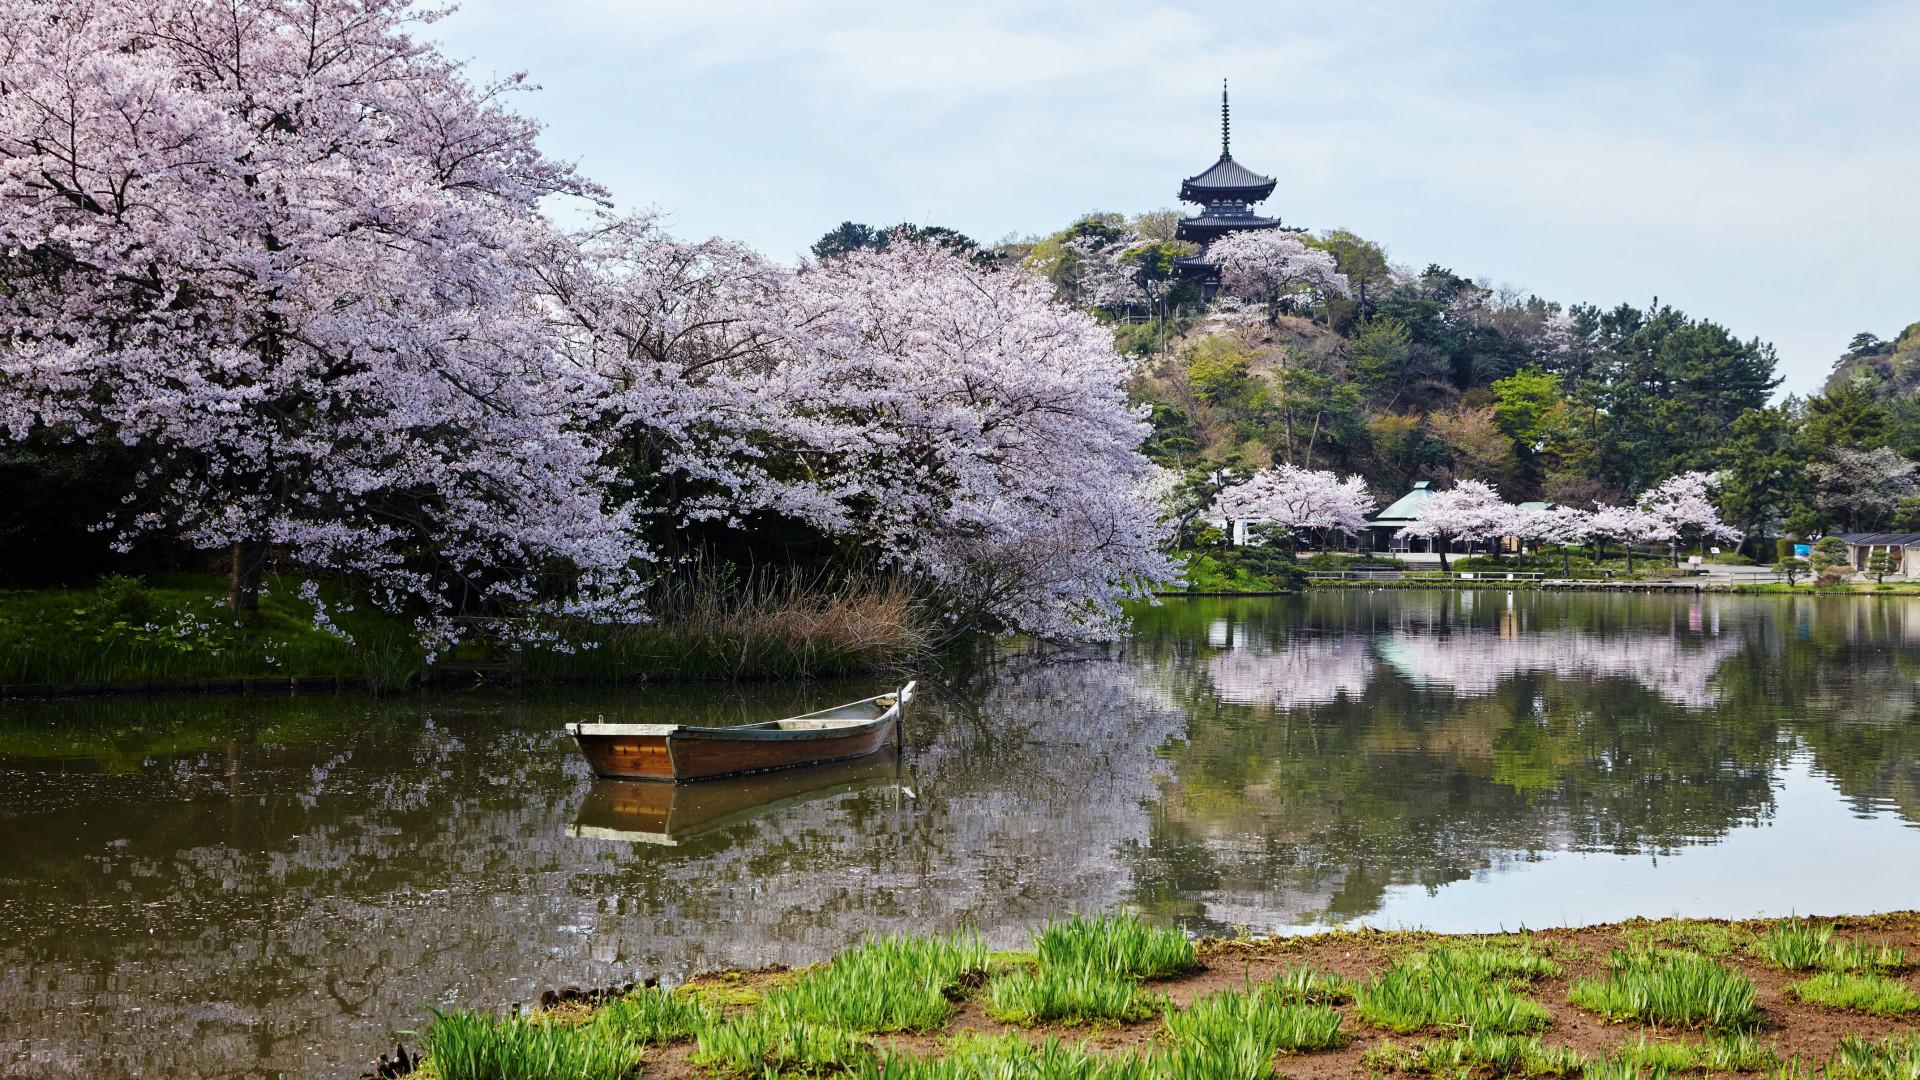 Japan Rugby World Cup 2019p: Yokohama's historic Sankeien garden